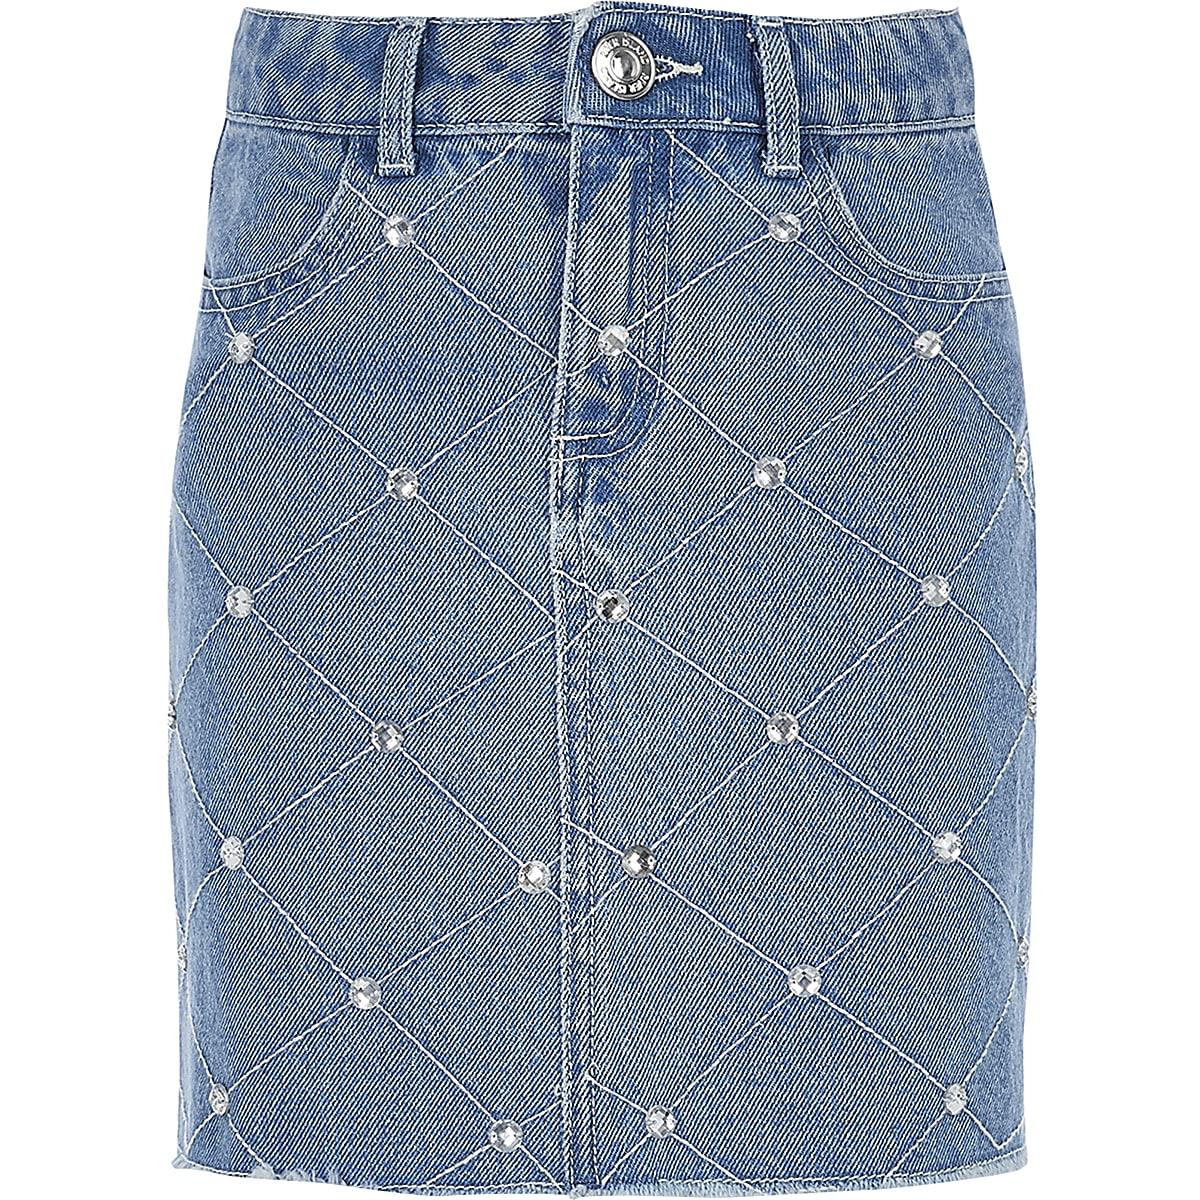 Girls blue rhinestone denim skirt